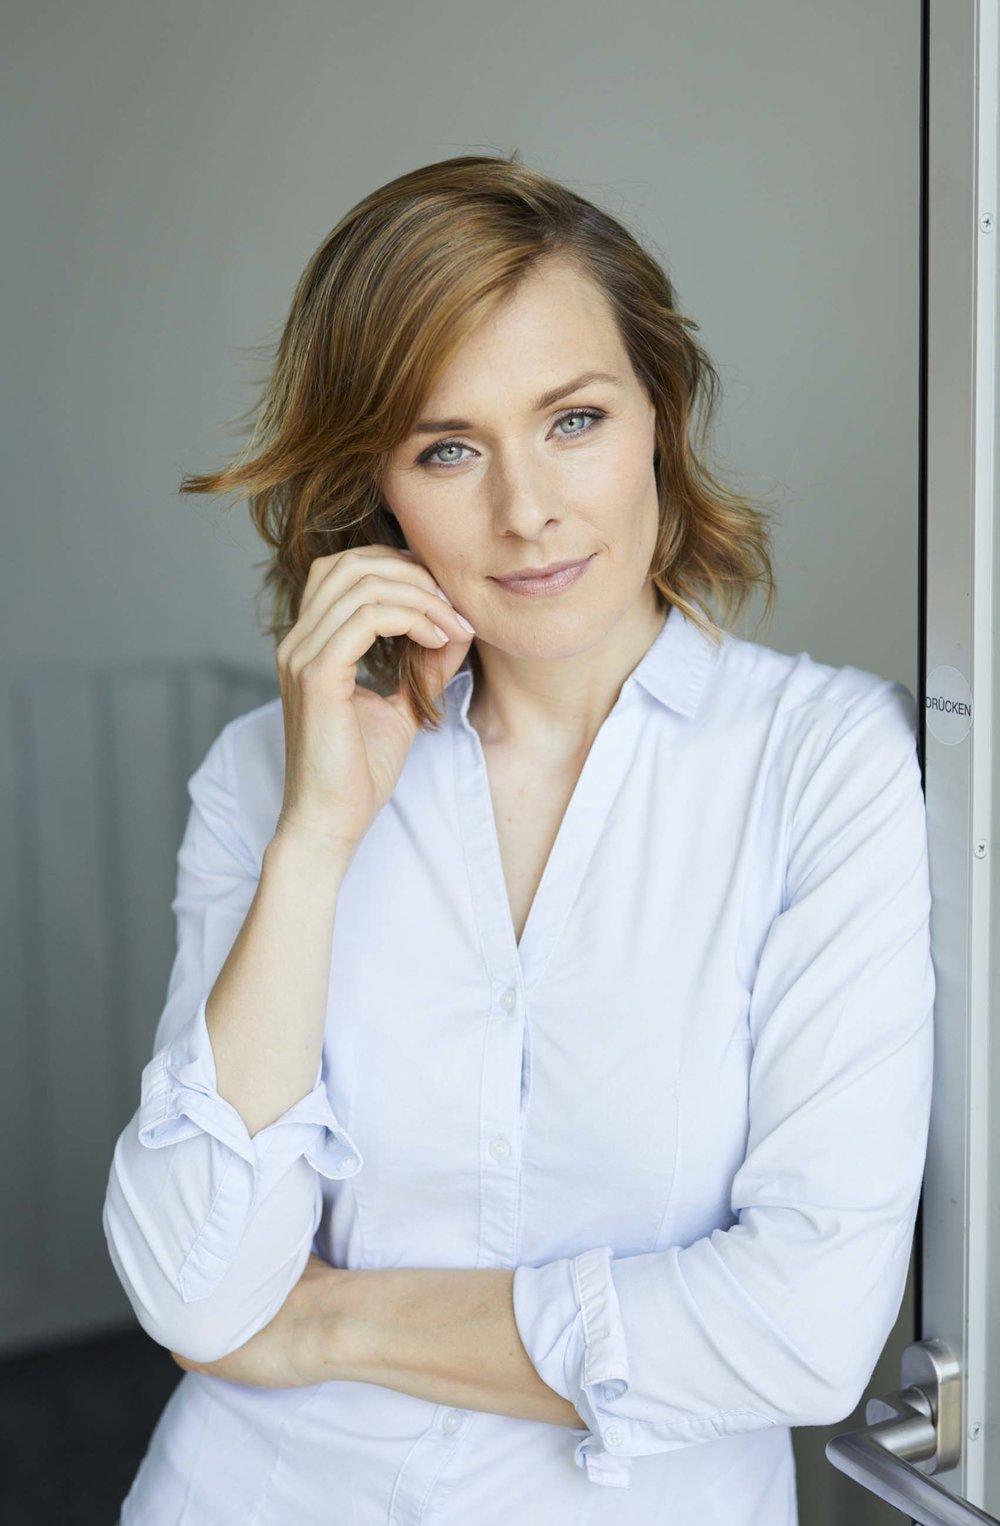 Alexandra-Hopf 22.jpg